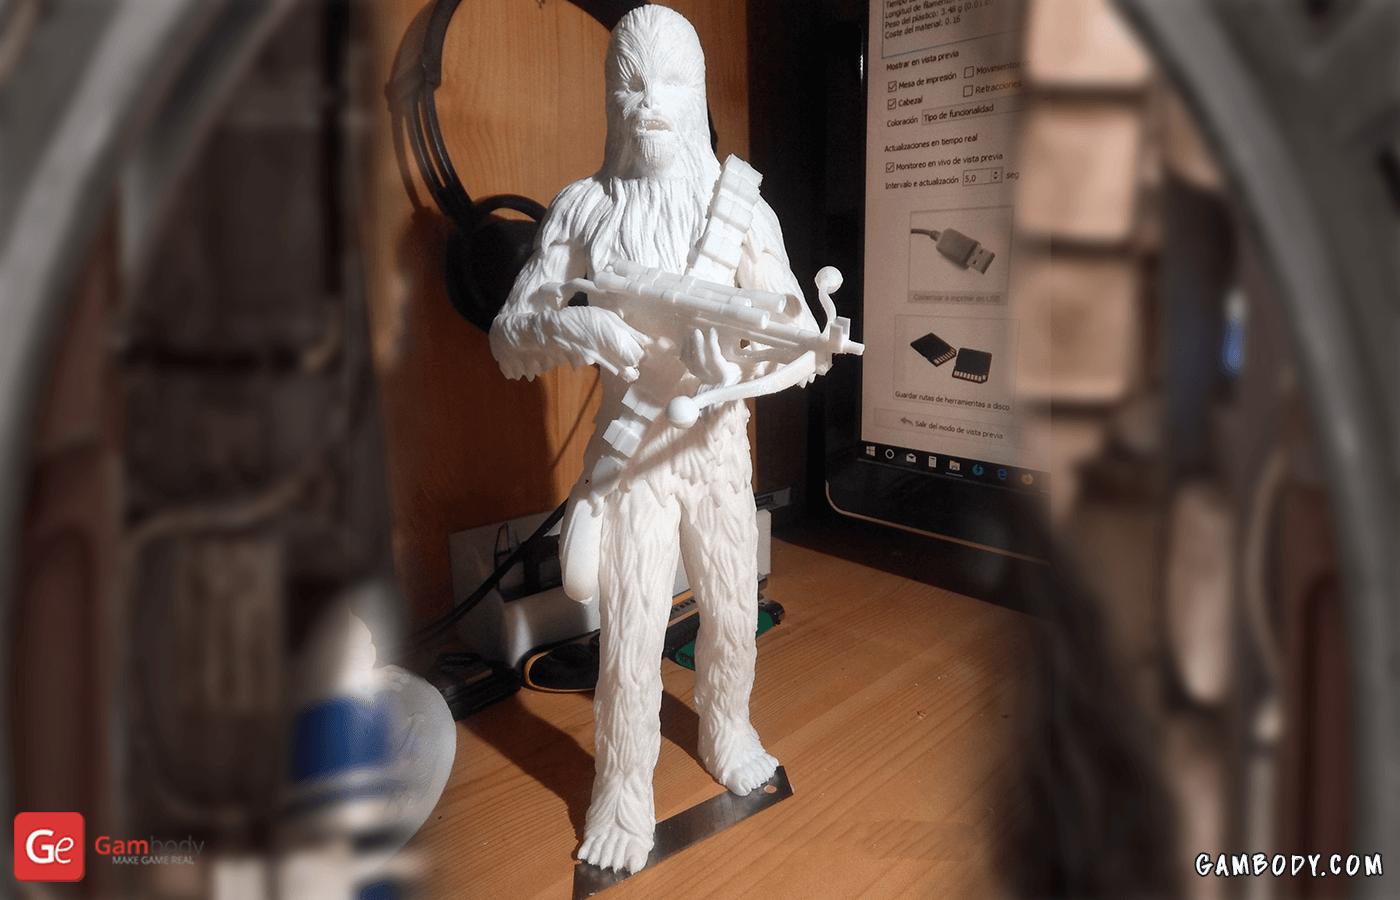 Chewbacca 3D Printing Figurine Photo 2